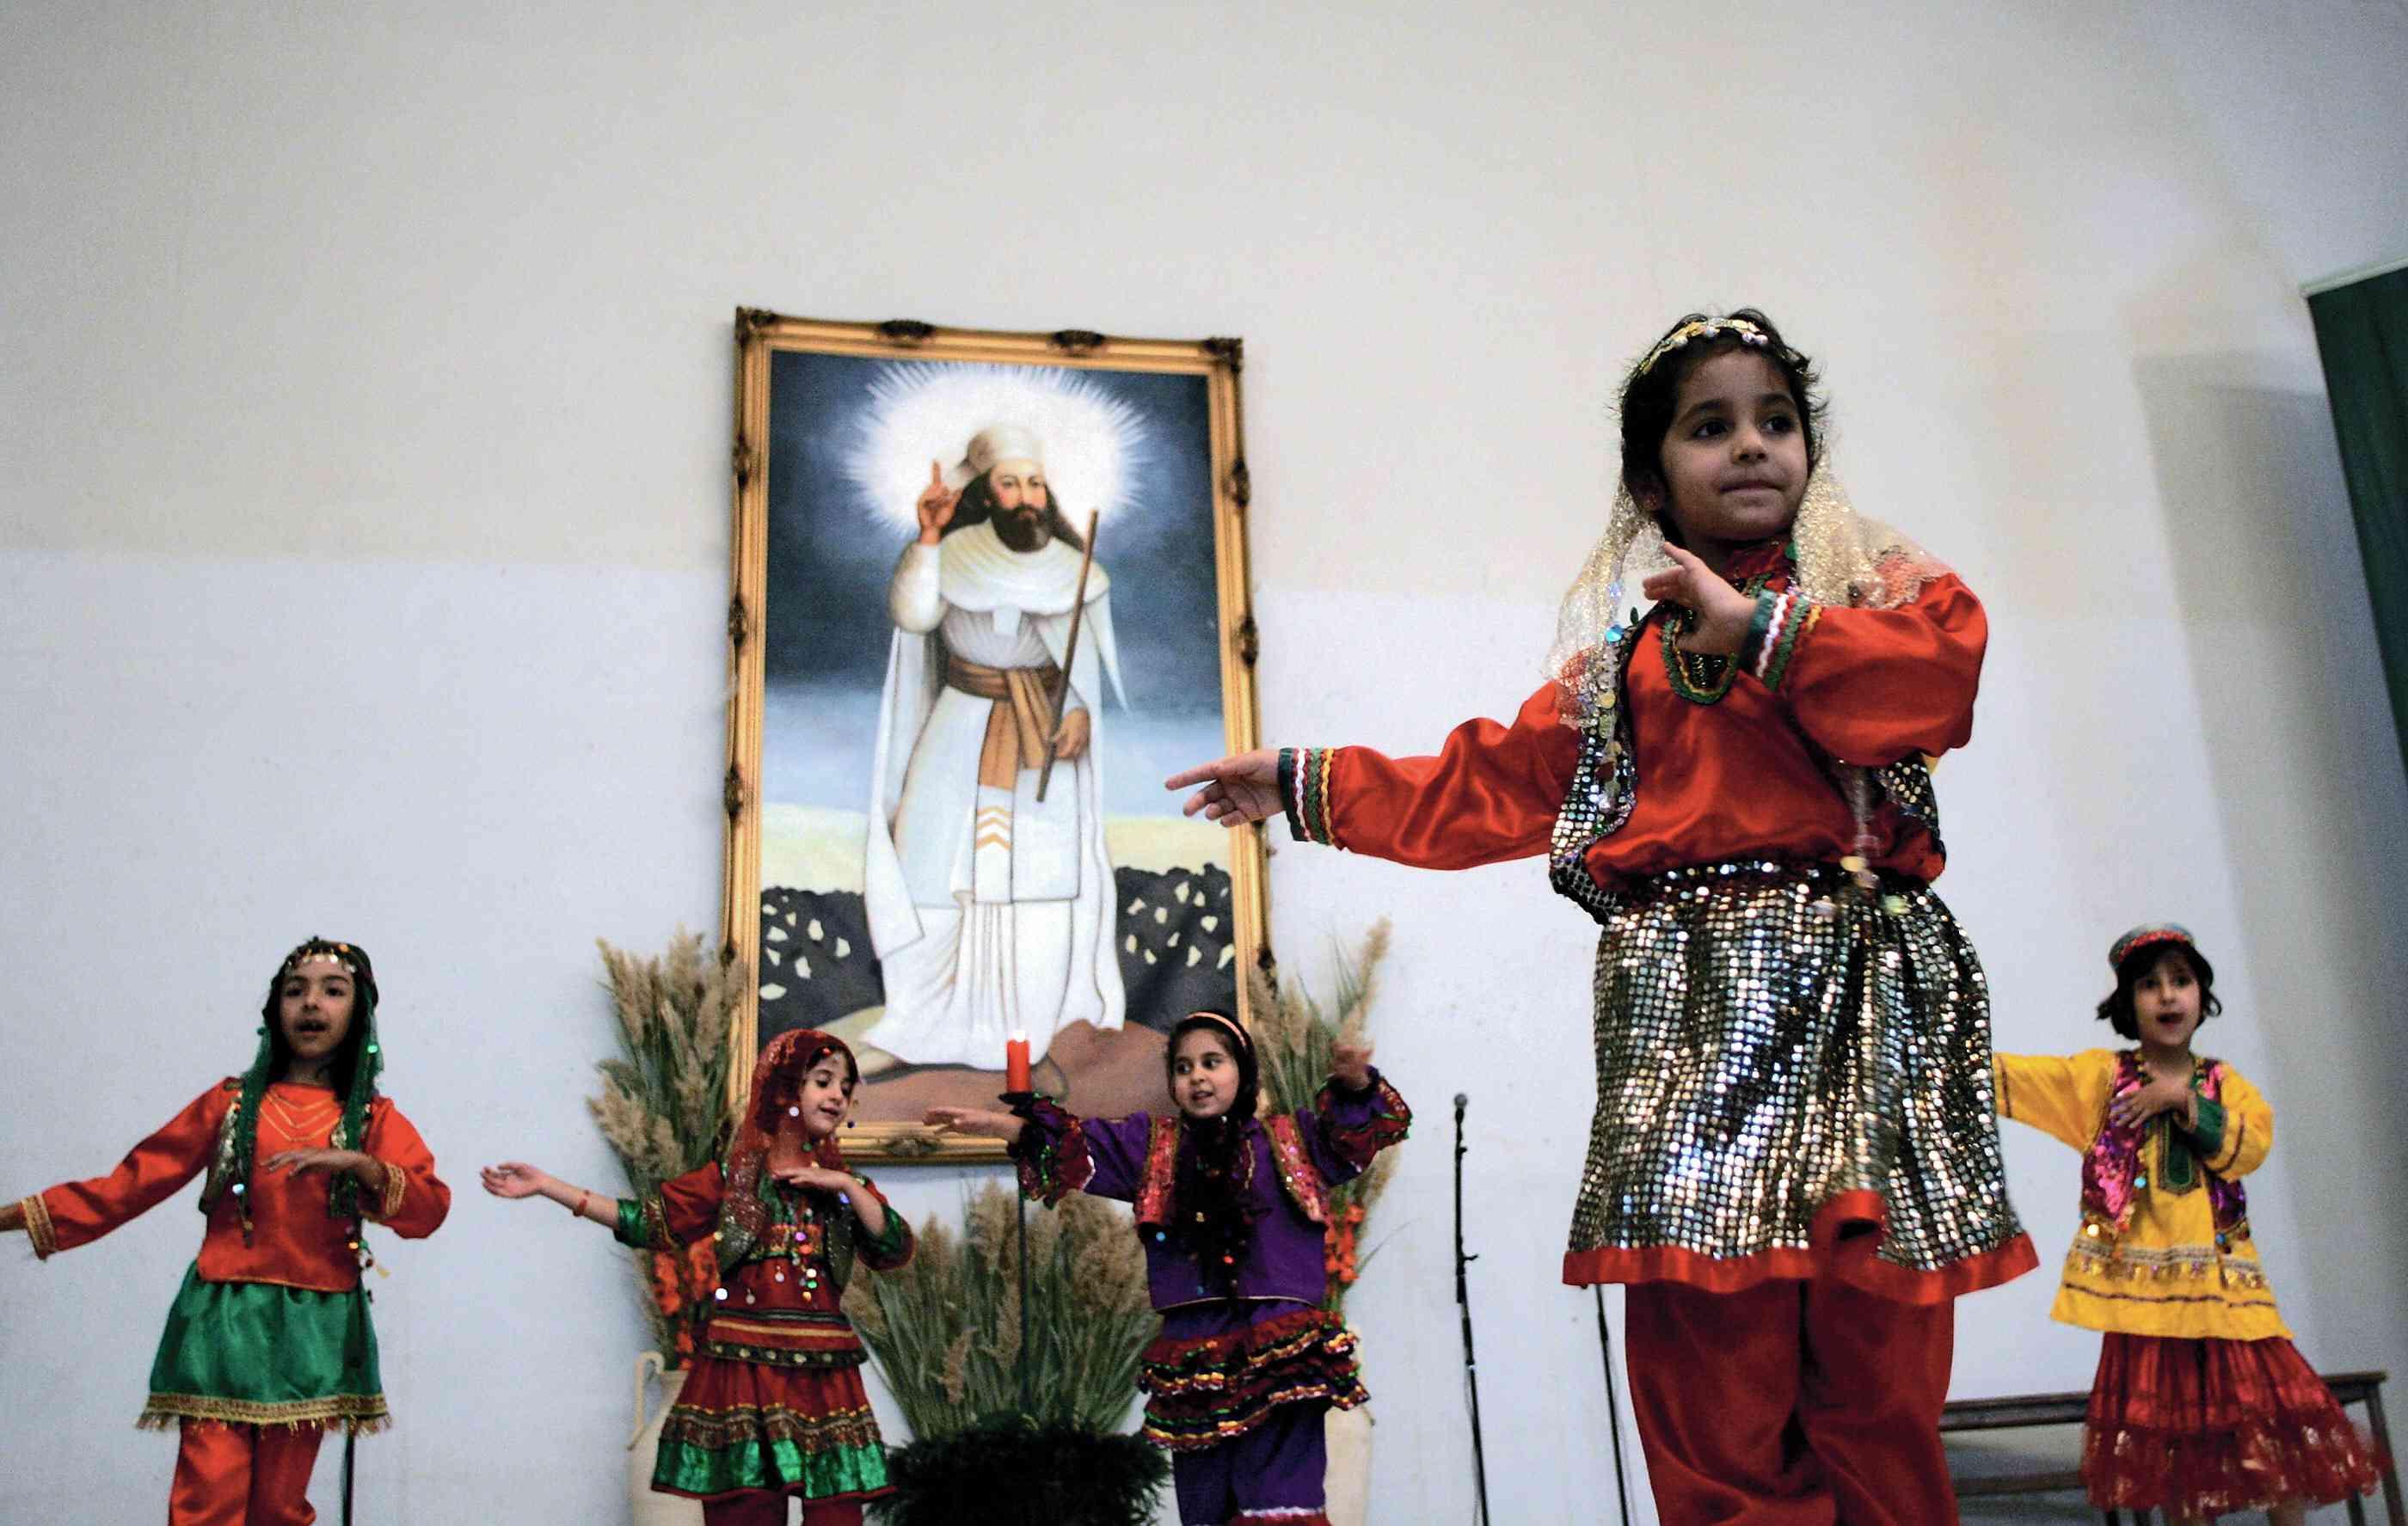 Iranian Zoroastrian girls perform a traditional dance